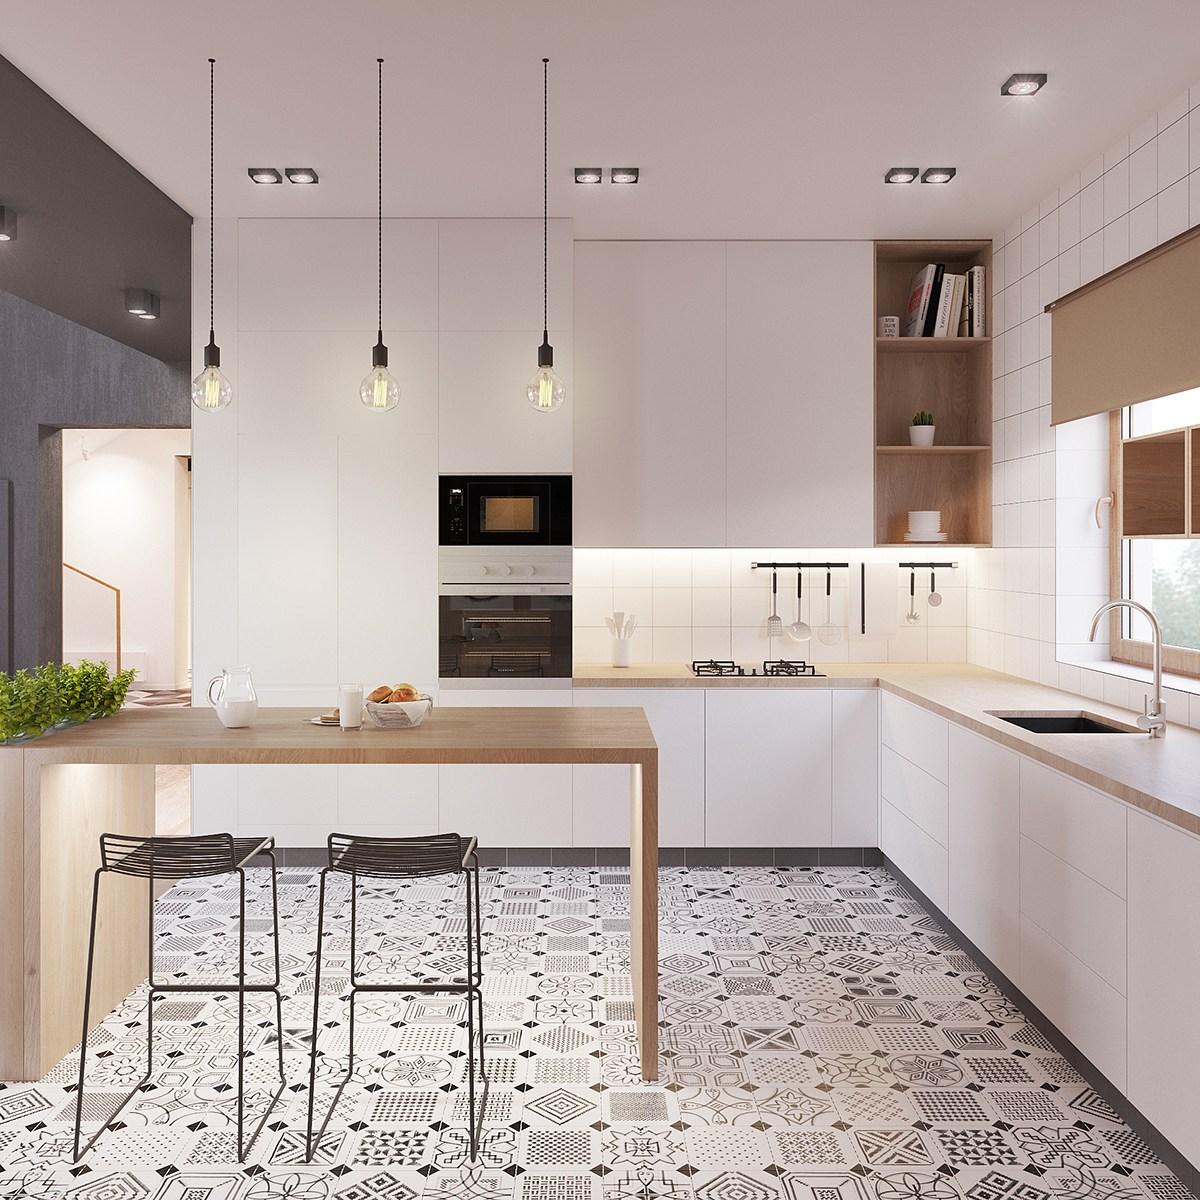 Danish Kitchen Tiles